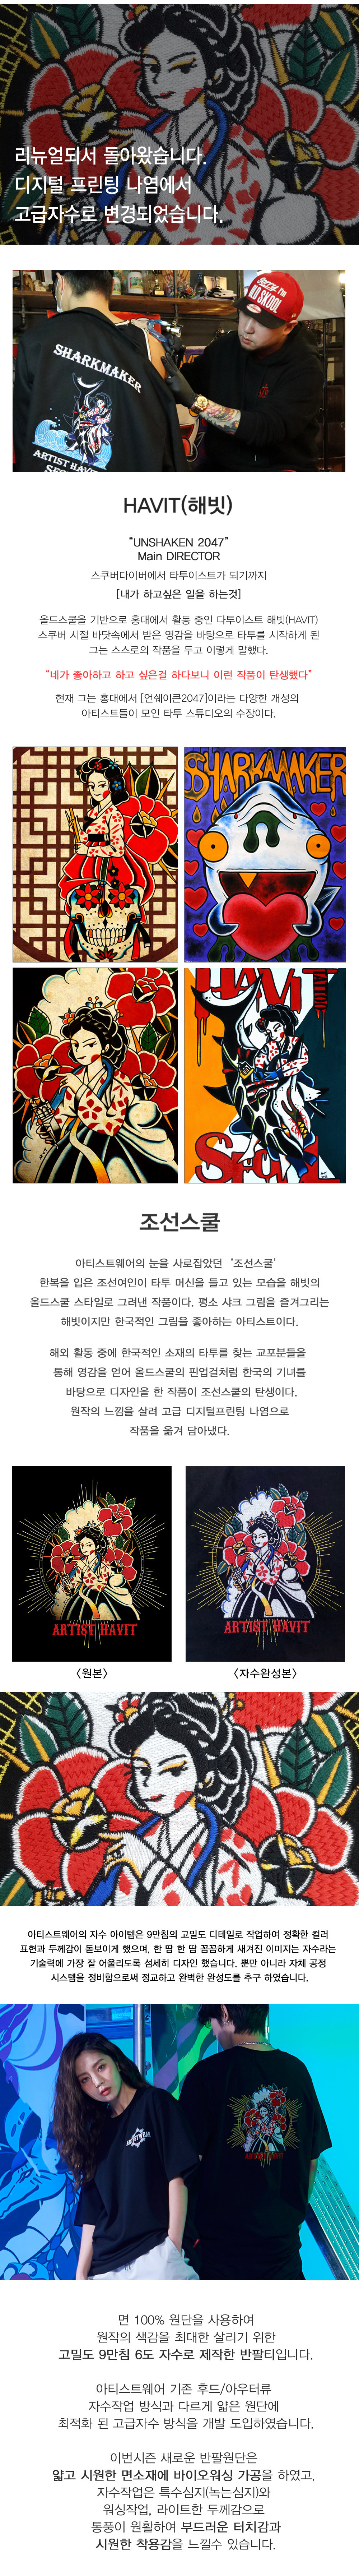 HAVIT_KOREA-SCHOOL_HALF_T-SHIRTS_BK_01.jpg